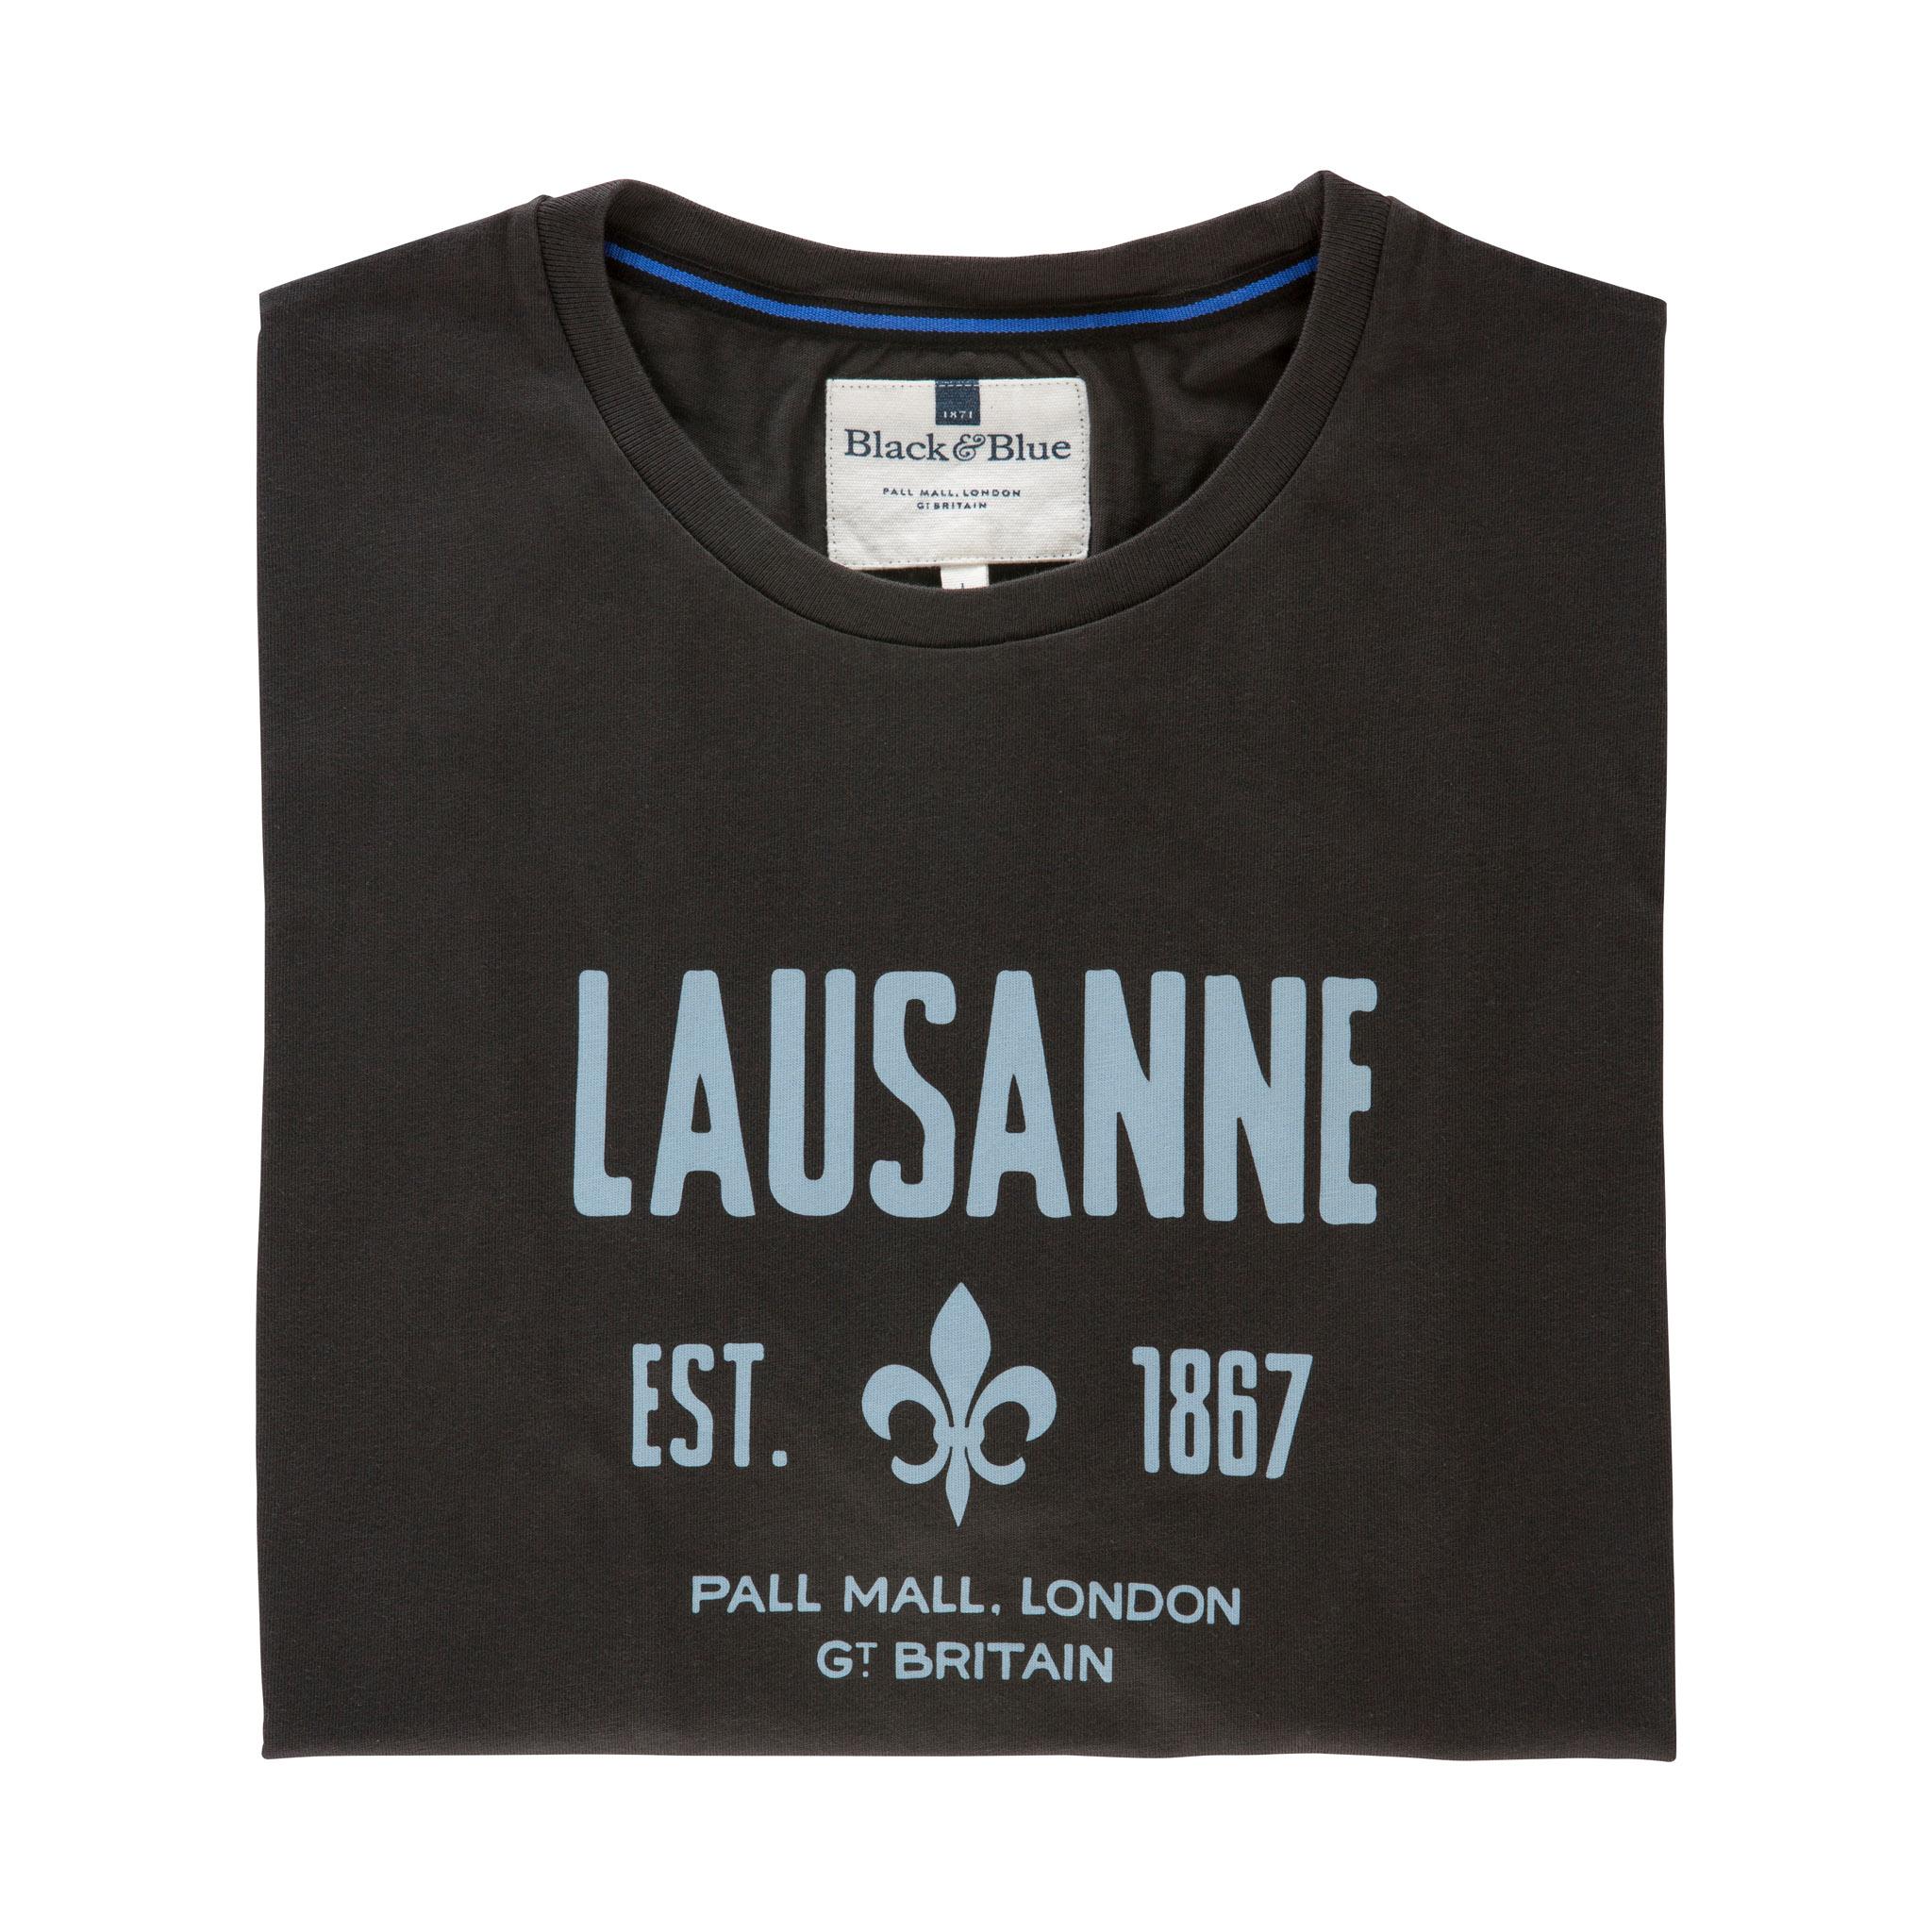 Lausanne Asphalt T-shirt - folded